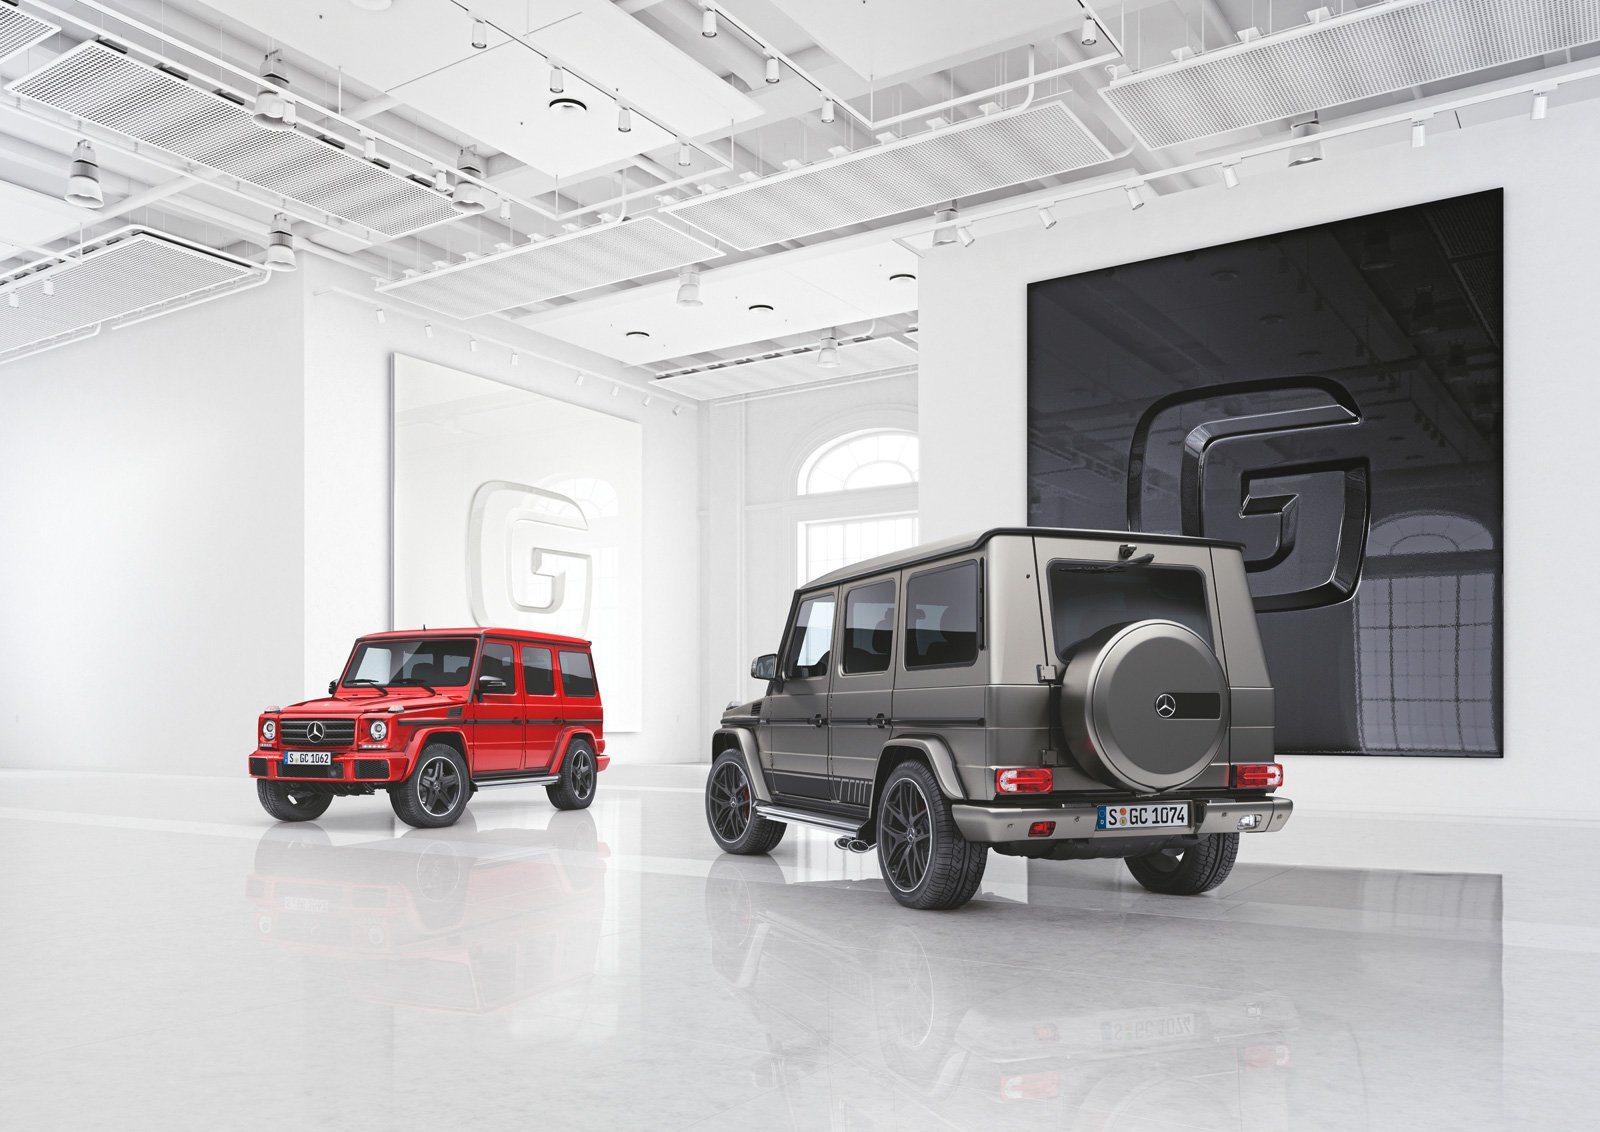 Mercedes Benz Designo Manufaktur and Exclusive Edition